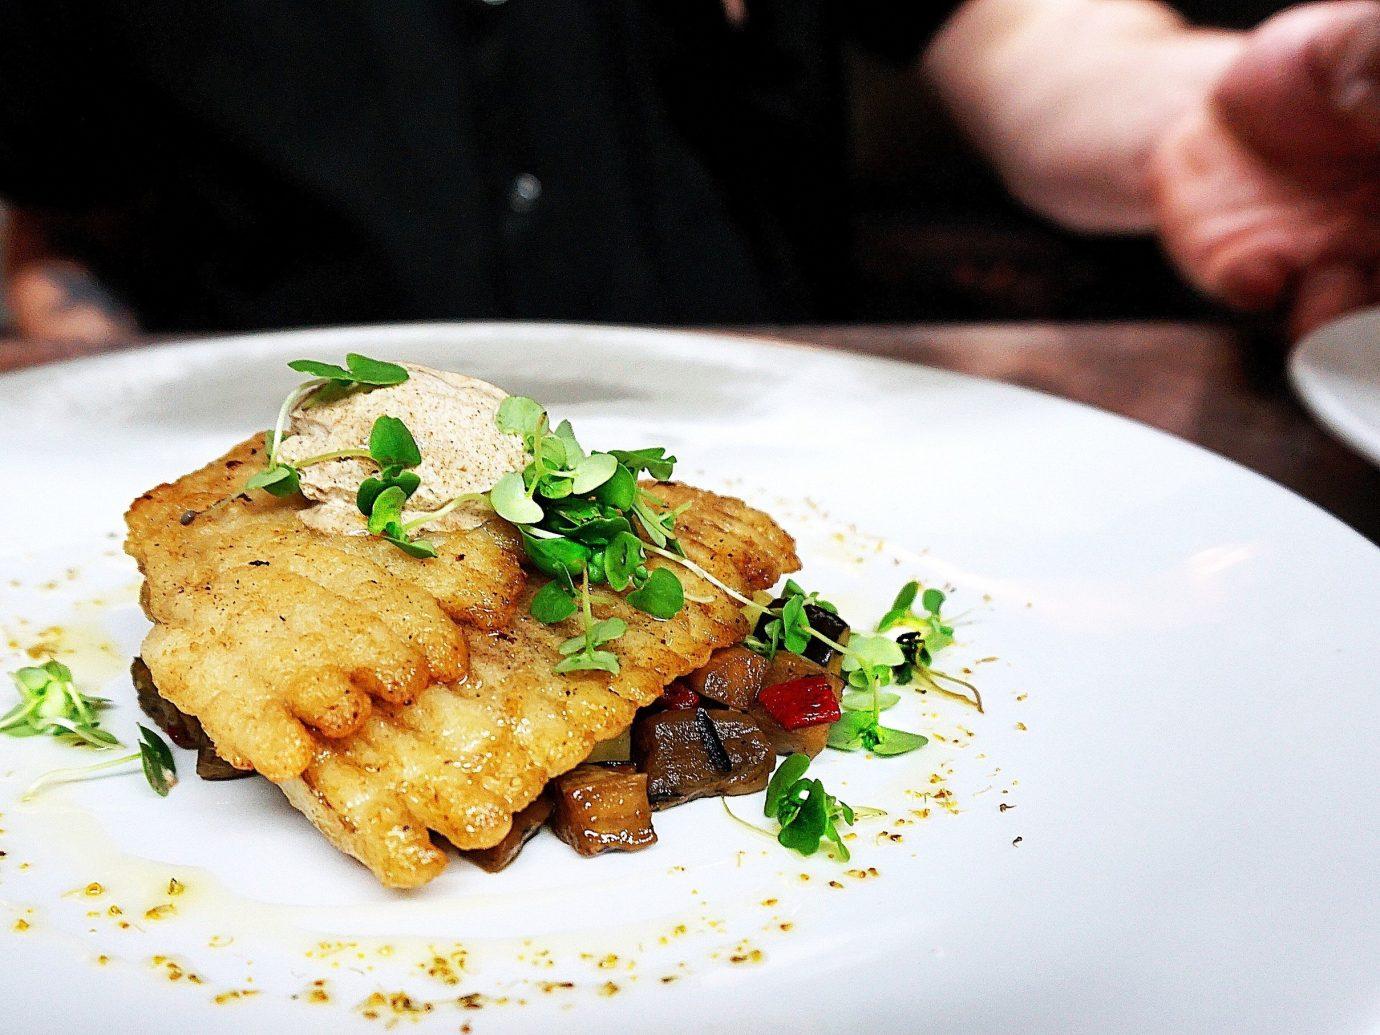 Summer Series plate food table person dish indoor meal white cuisine fish meat breakfast produce restaurant steak dinner piece de resistance